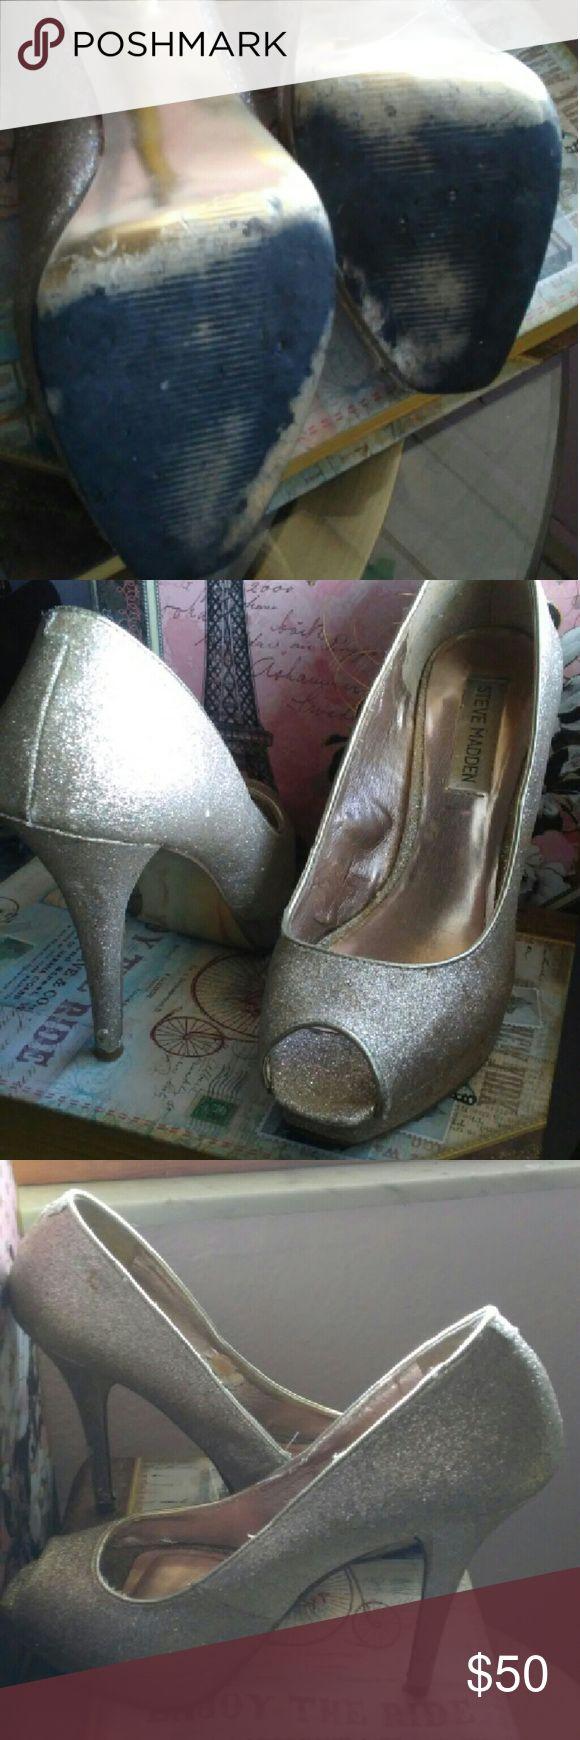 Steve Madden open toe gold glitter pumps Used. Light tear on inside. In good conditon. Shoes Heels